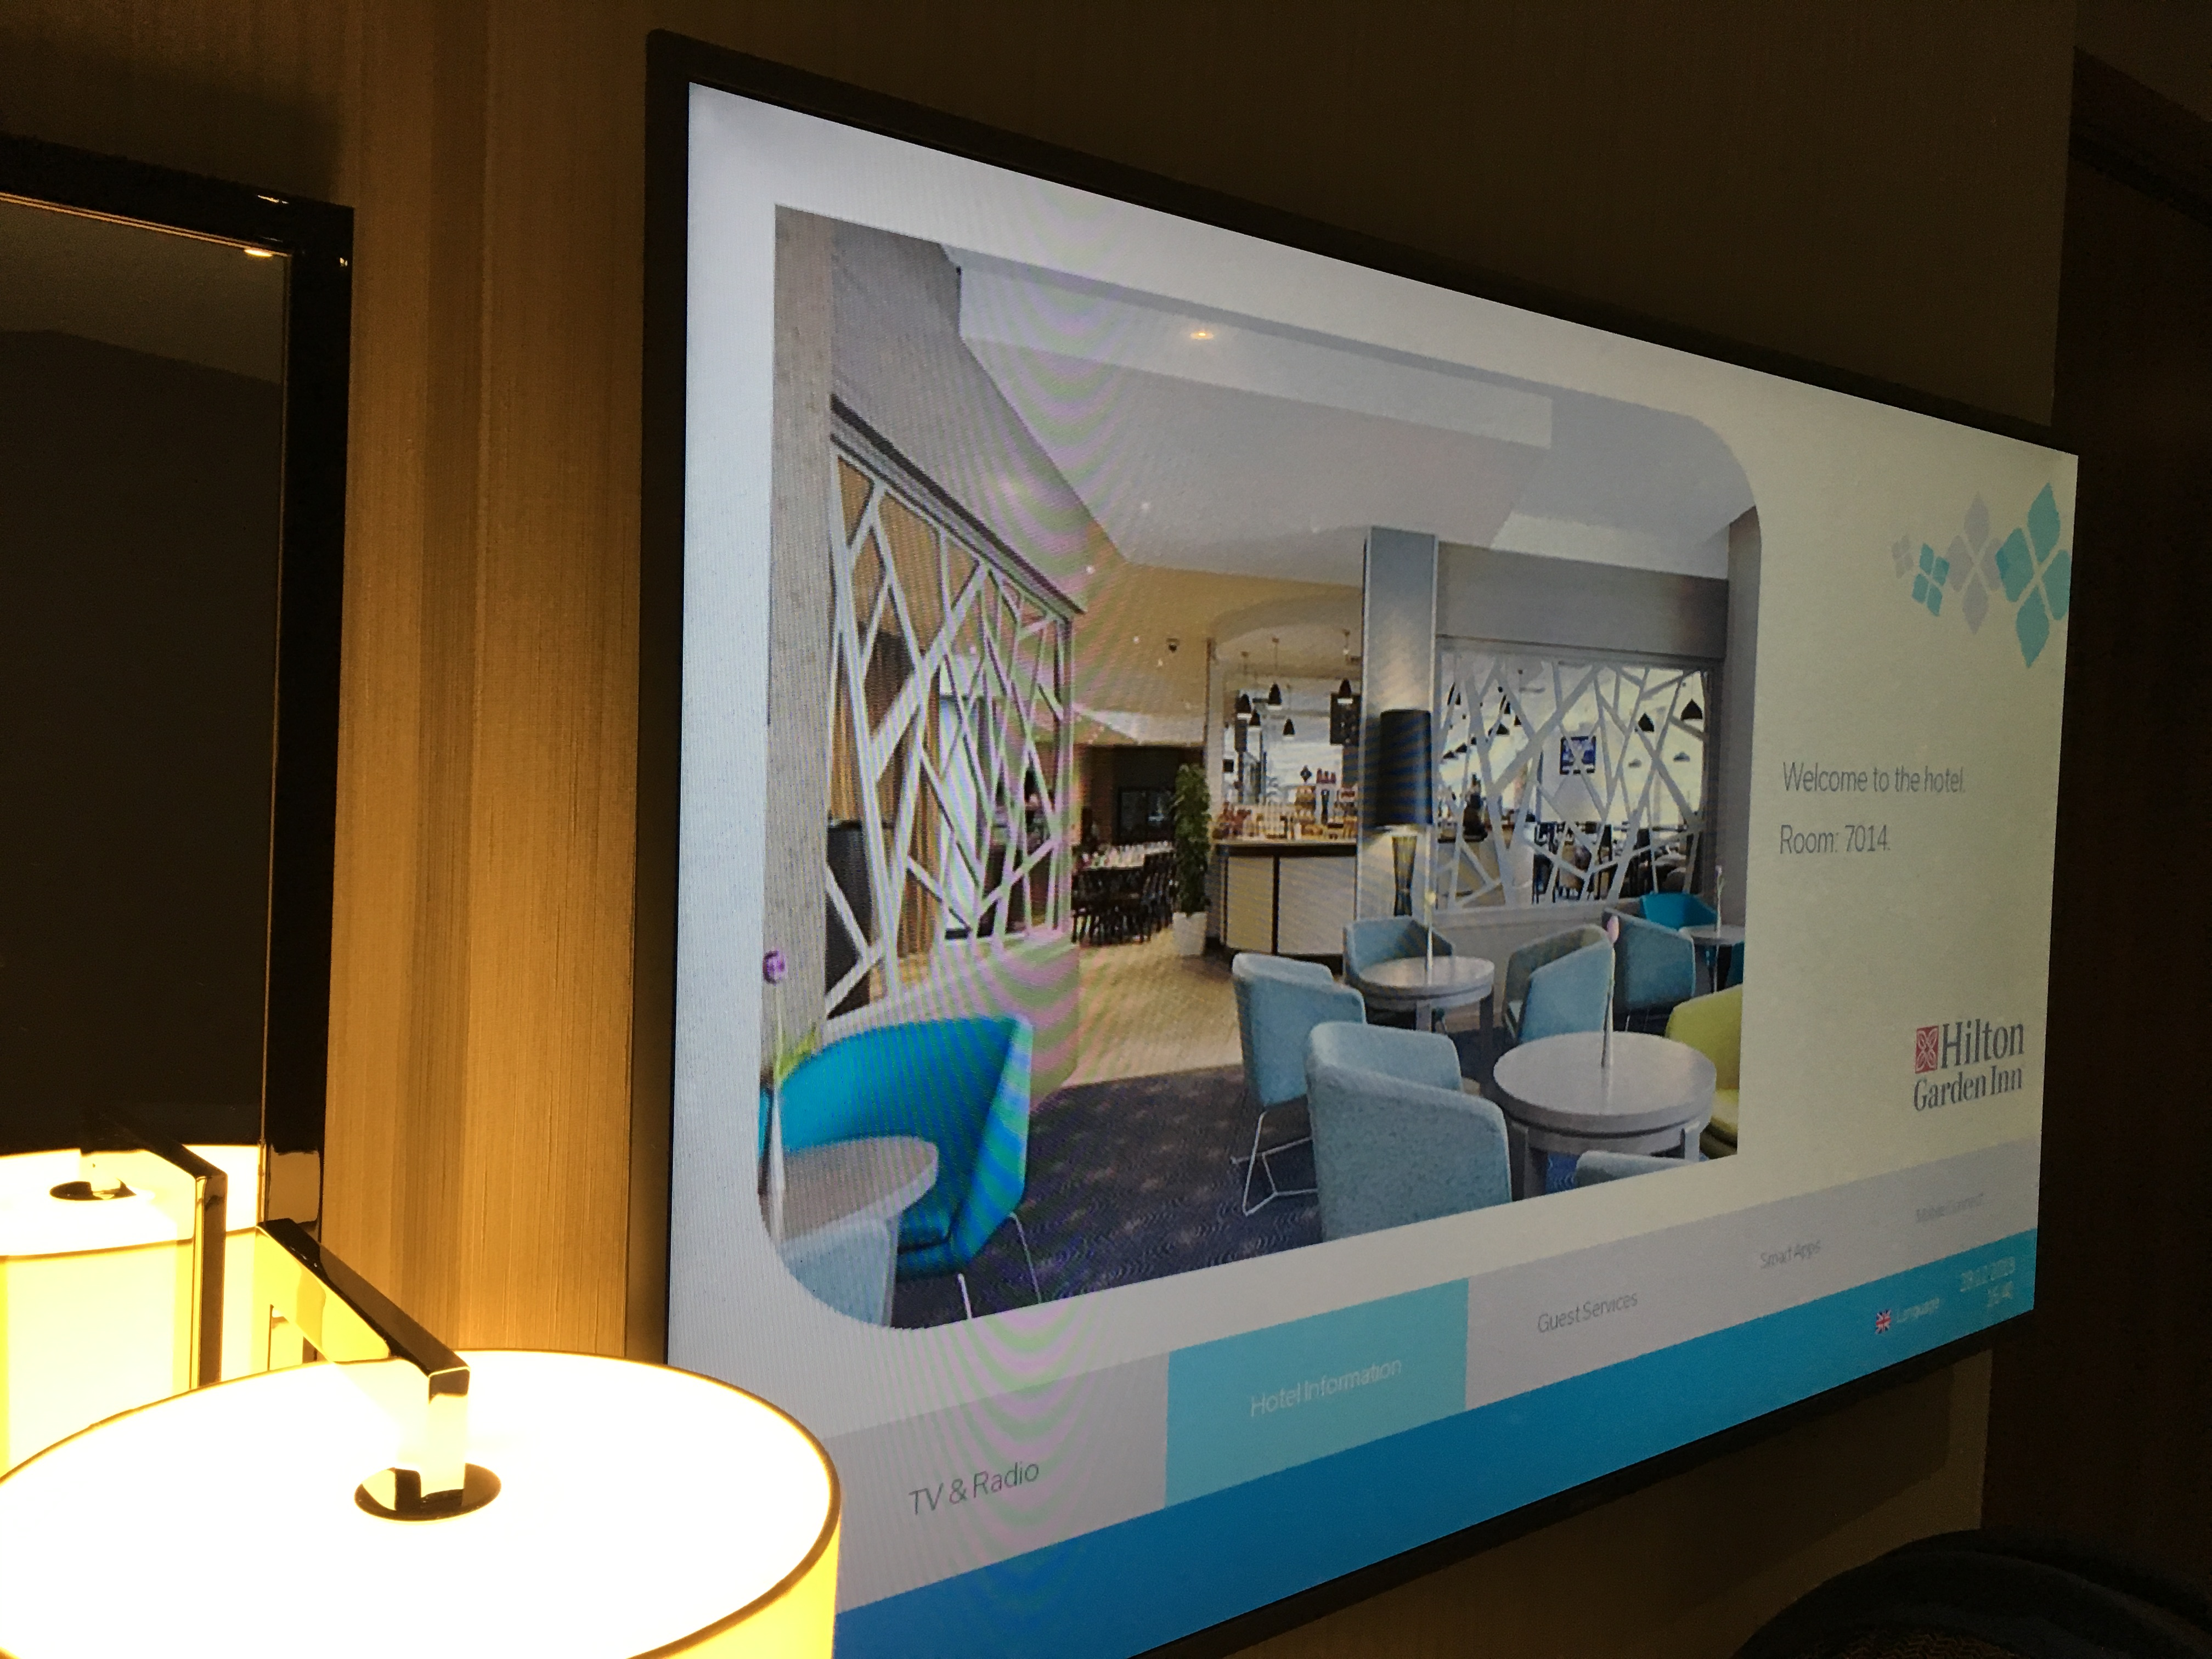 Hotel Review : ヒルトンガーデンイン ロンドンヒースロー ターミナル2, 3(Hilton Garden Inn London Heathrow Terminals 2 and 3)